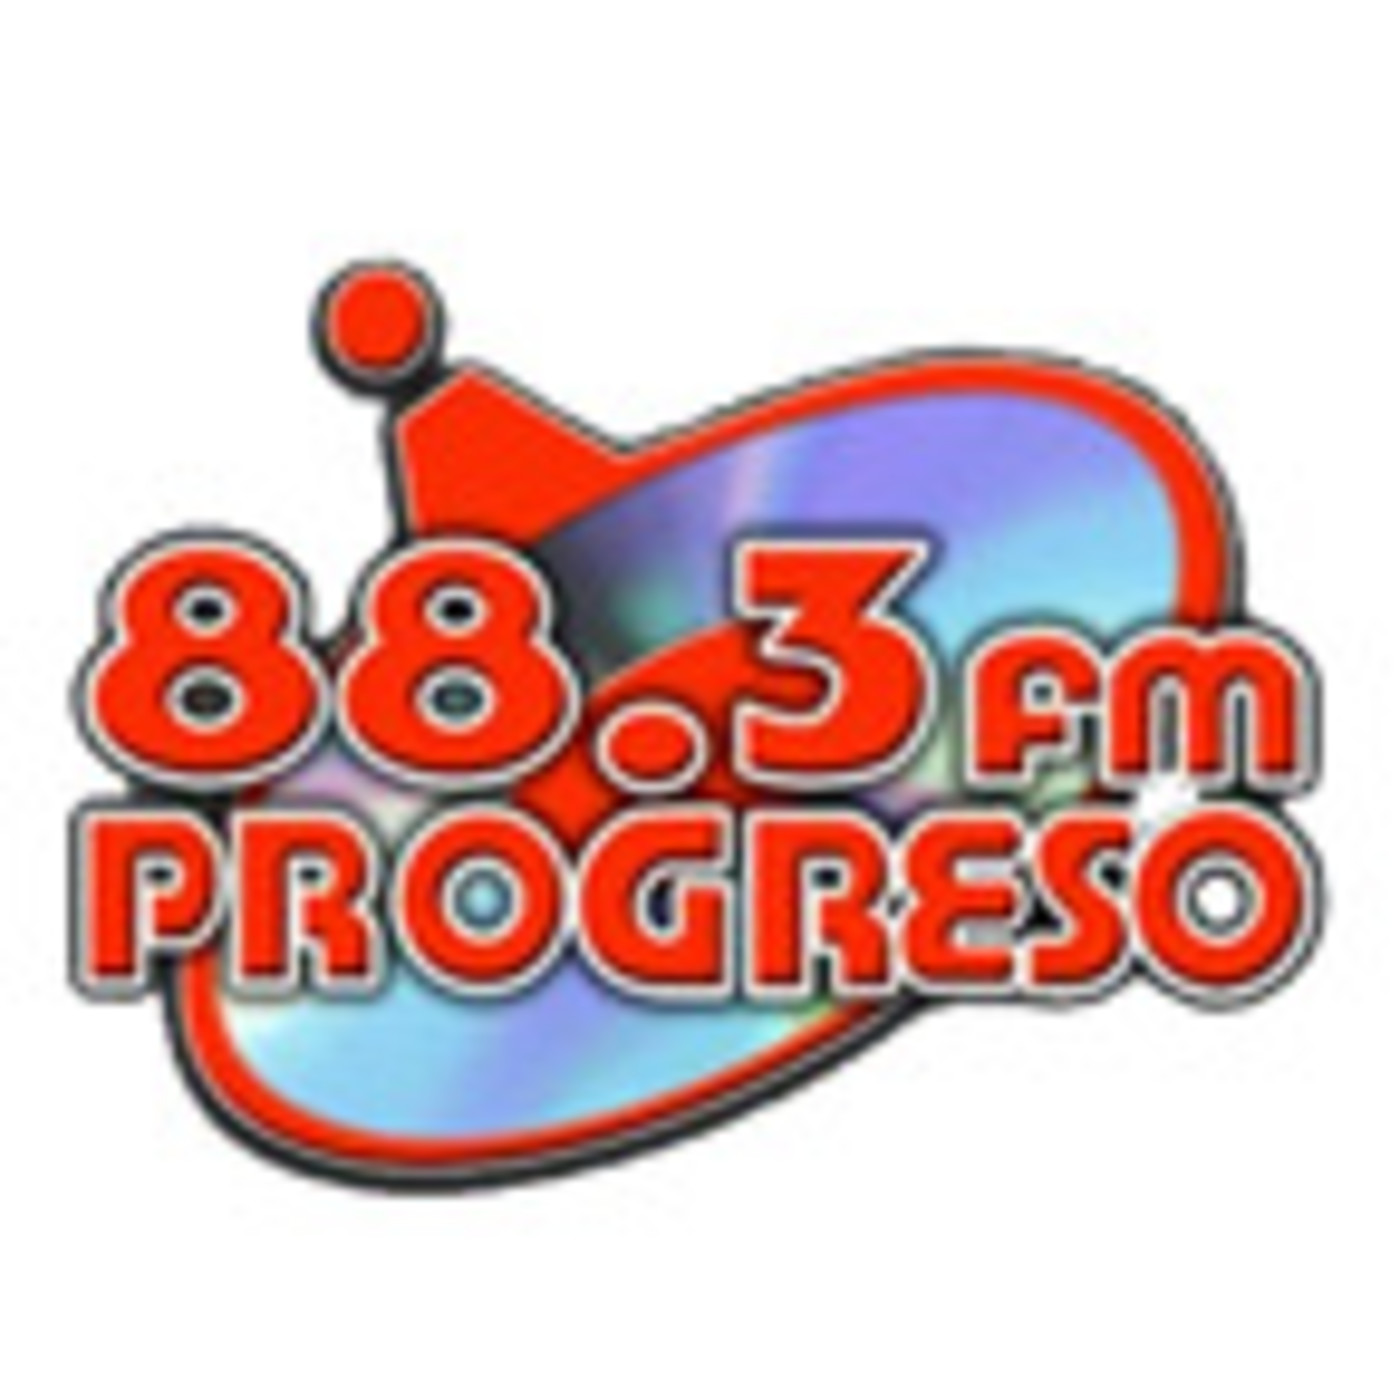 Progreso Fm 88.3